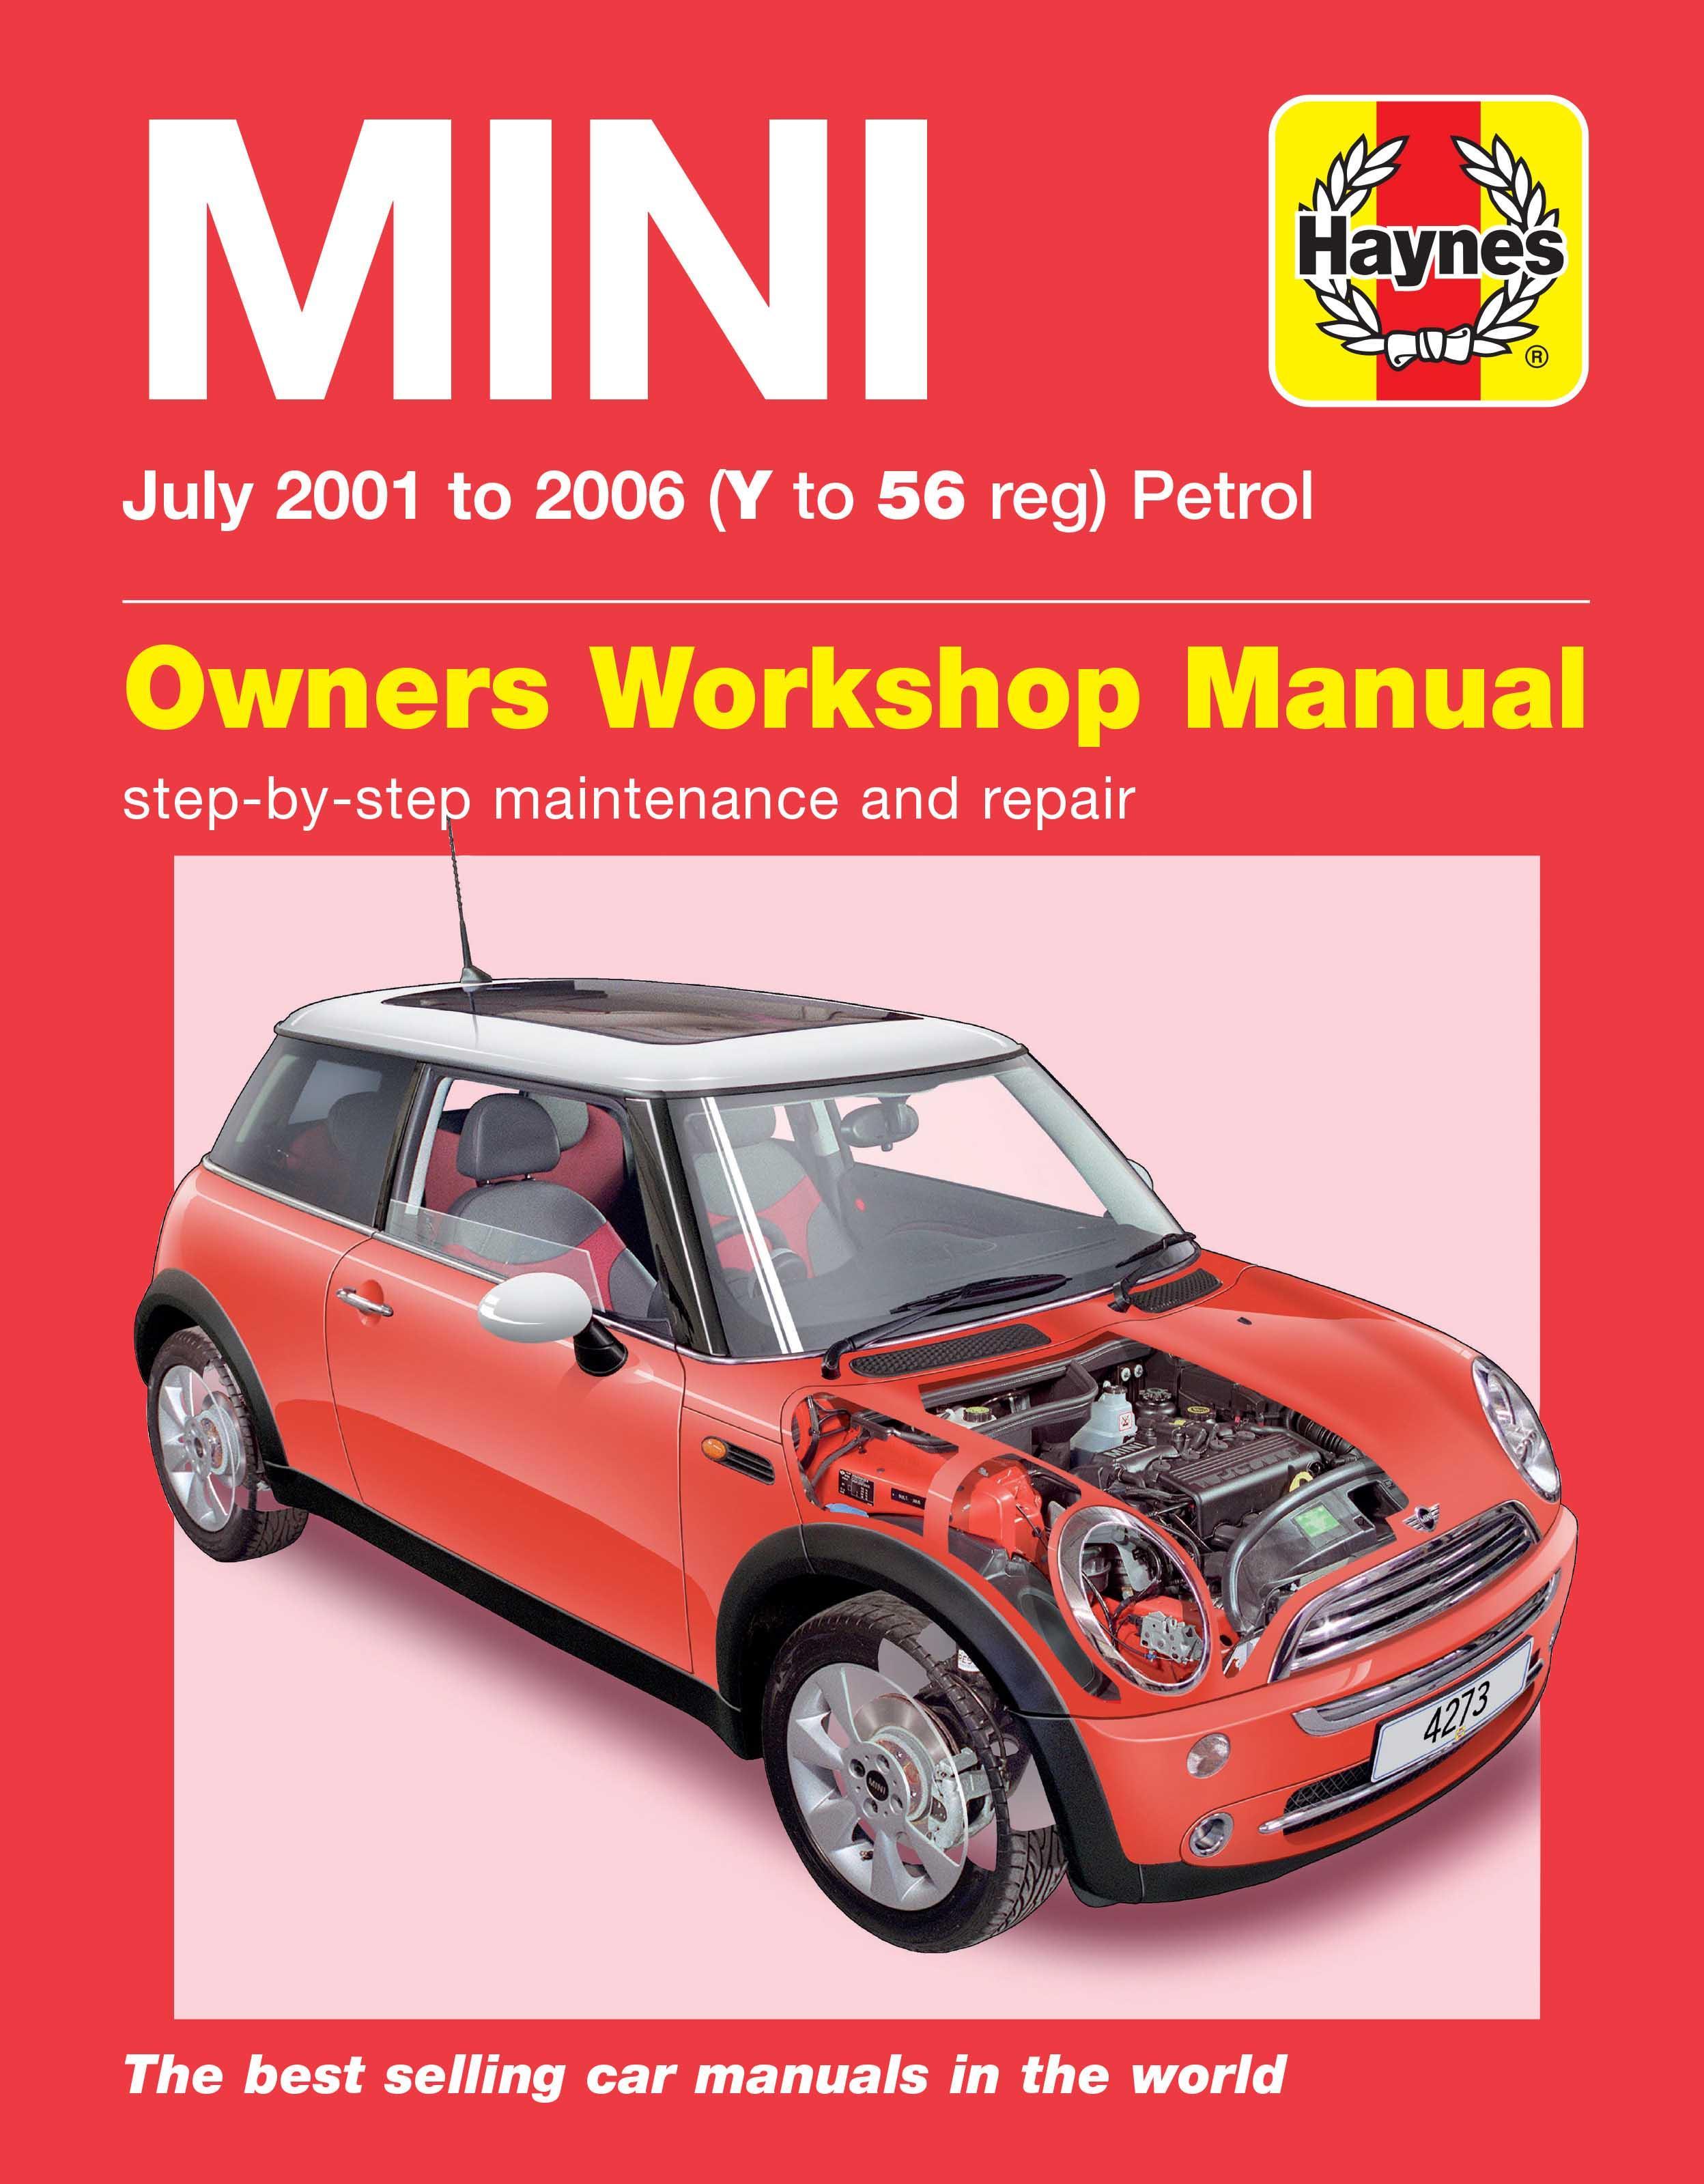 hight resolution of haynes bmw mini 01 05 manual 2004 mini cooper radio wiring diagram as well as balancing chemical